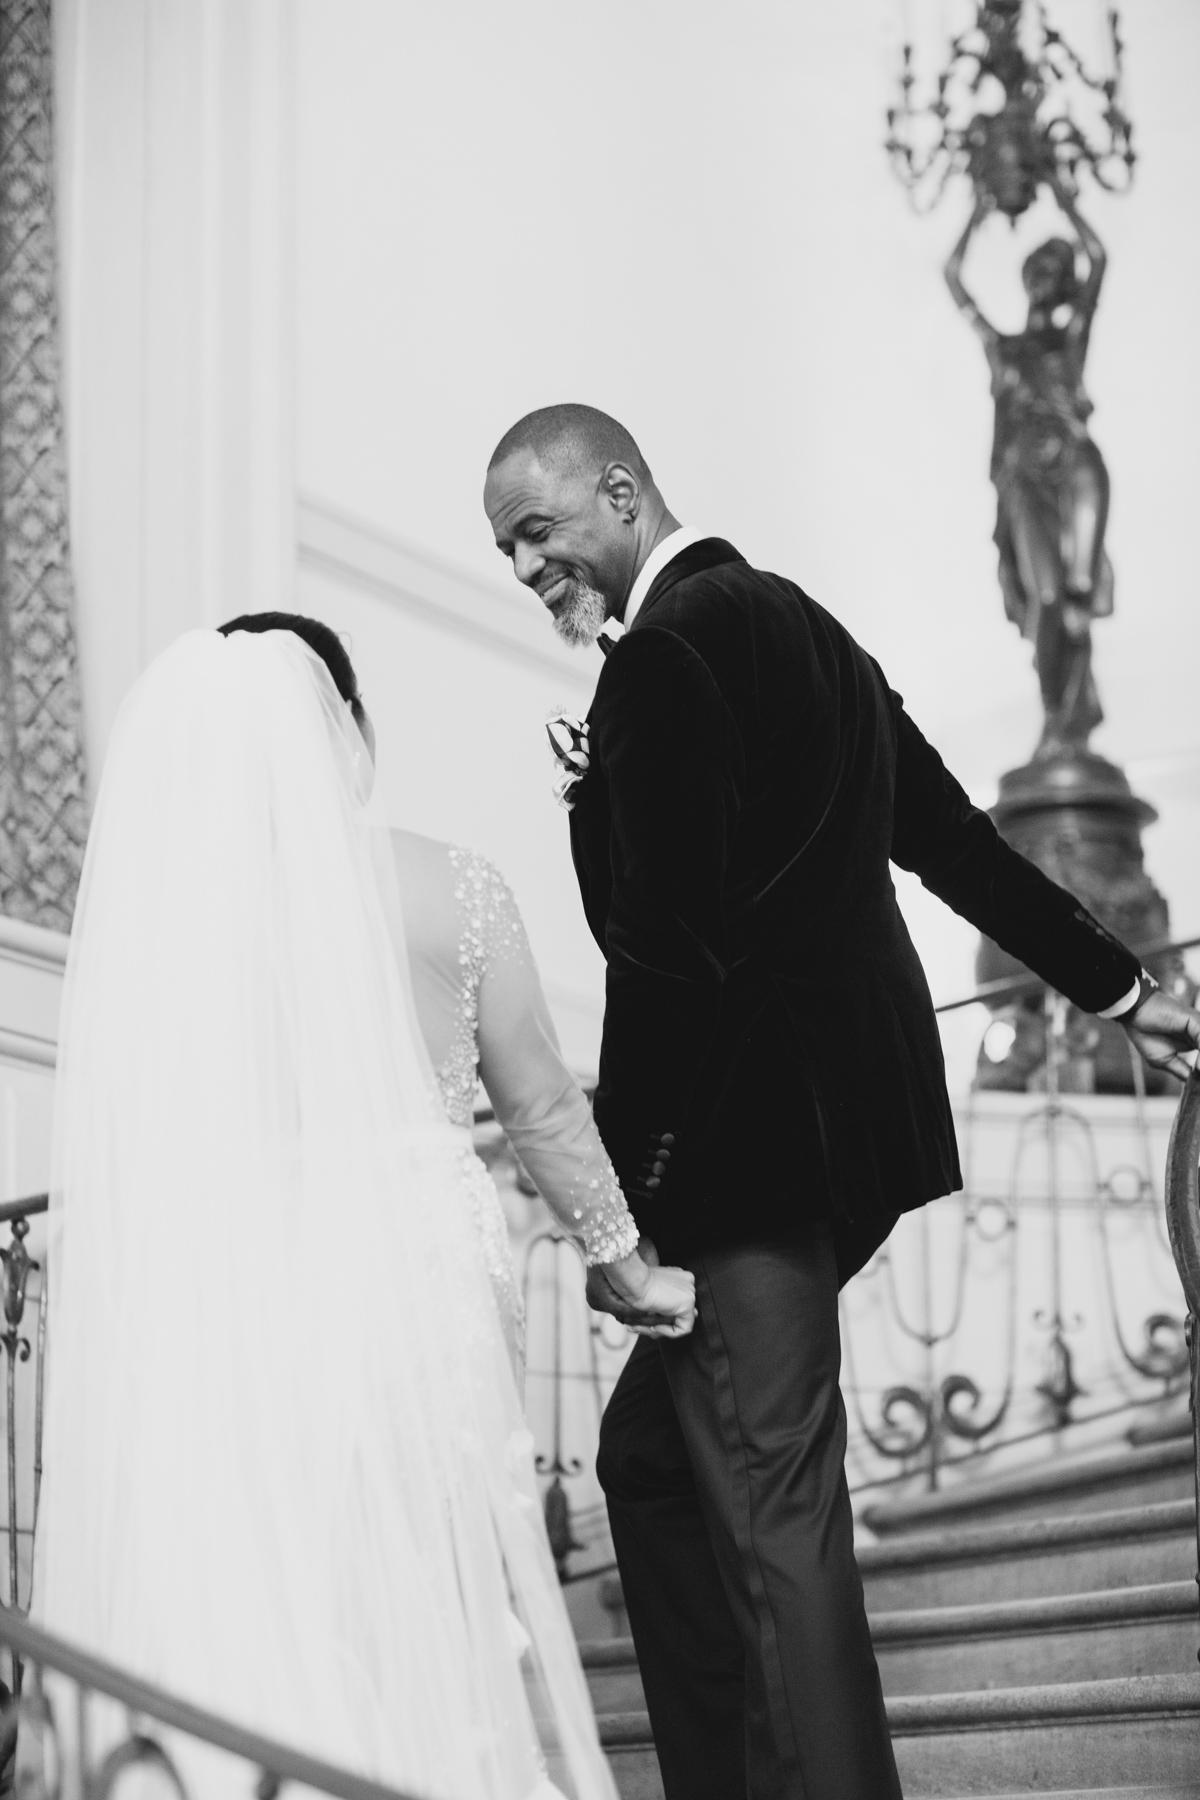 Brian-McKnight-oheka-castle-wedding-92.jpg